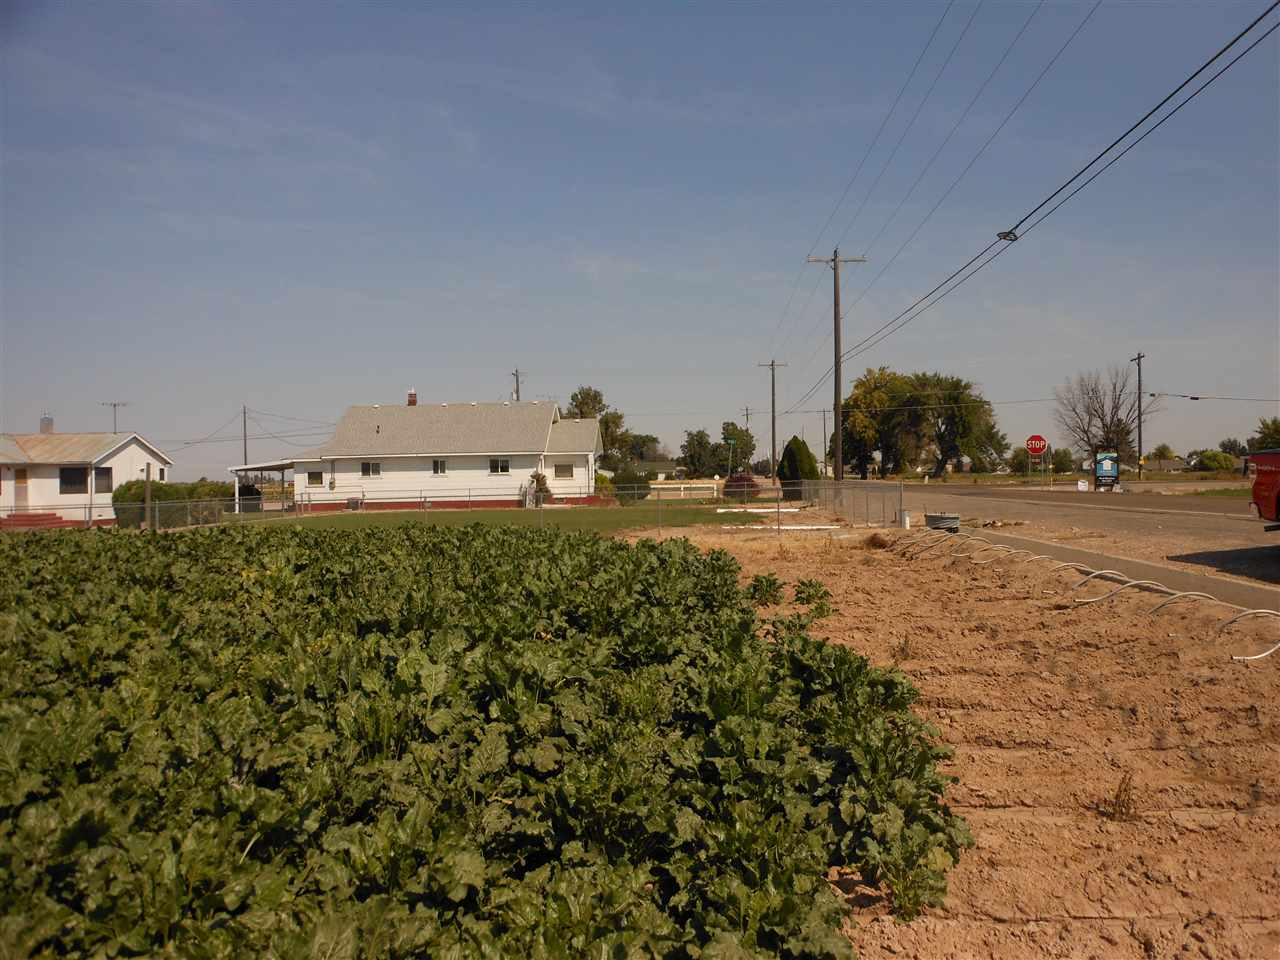 11021 Ustick Rd.,Nampa,Idaho 83687,Land,11021 Ustick Rd.,98633085